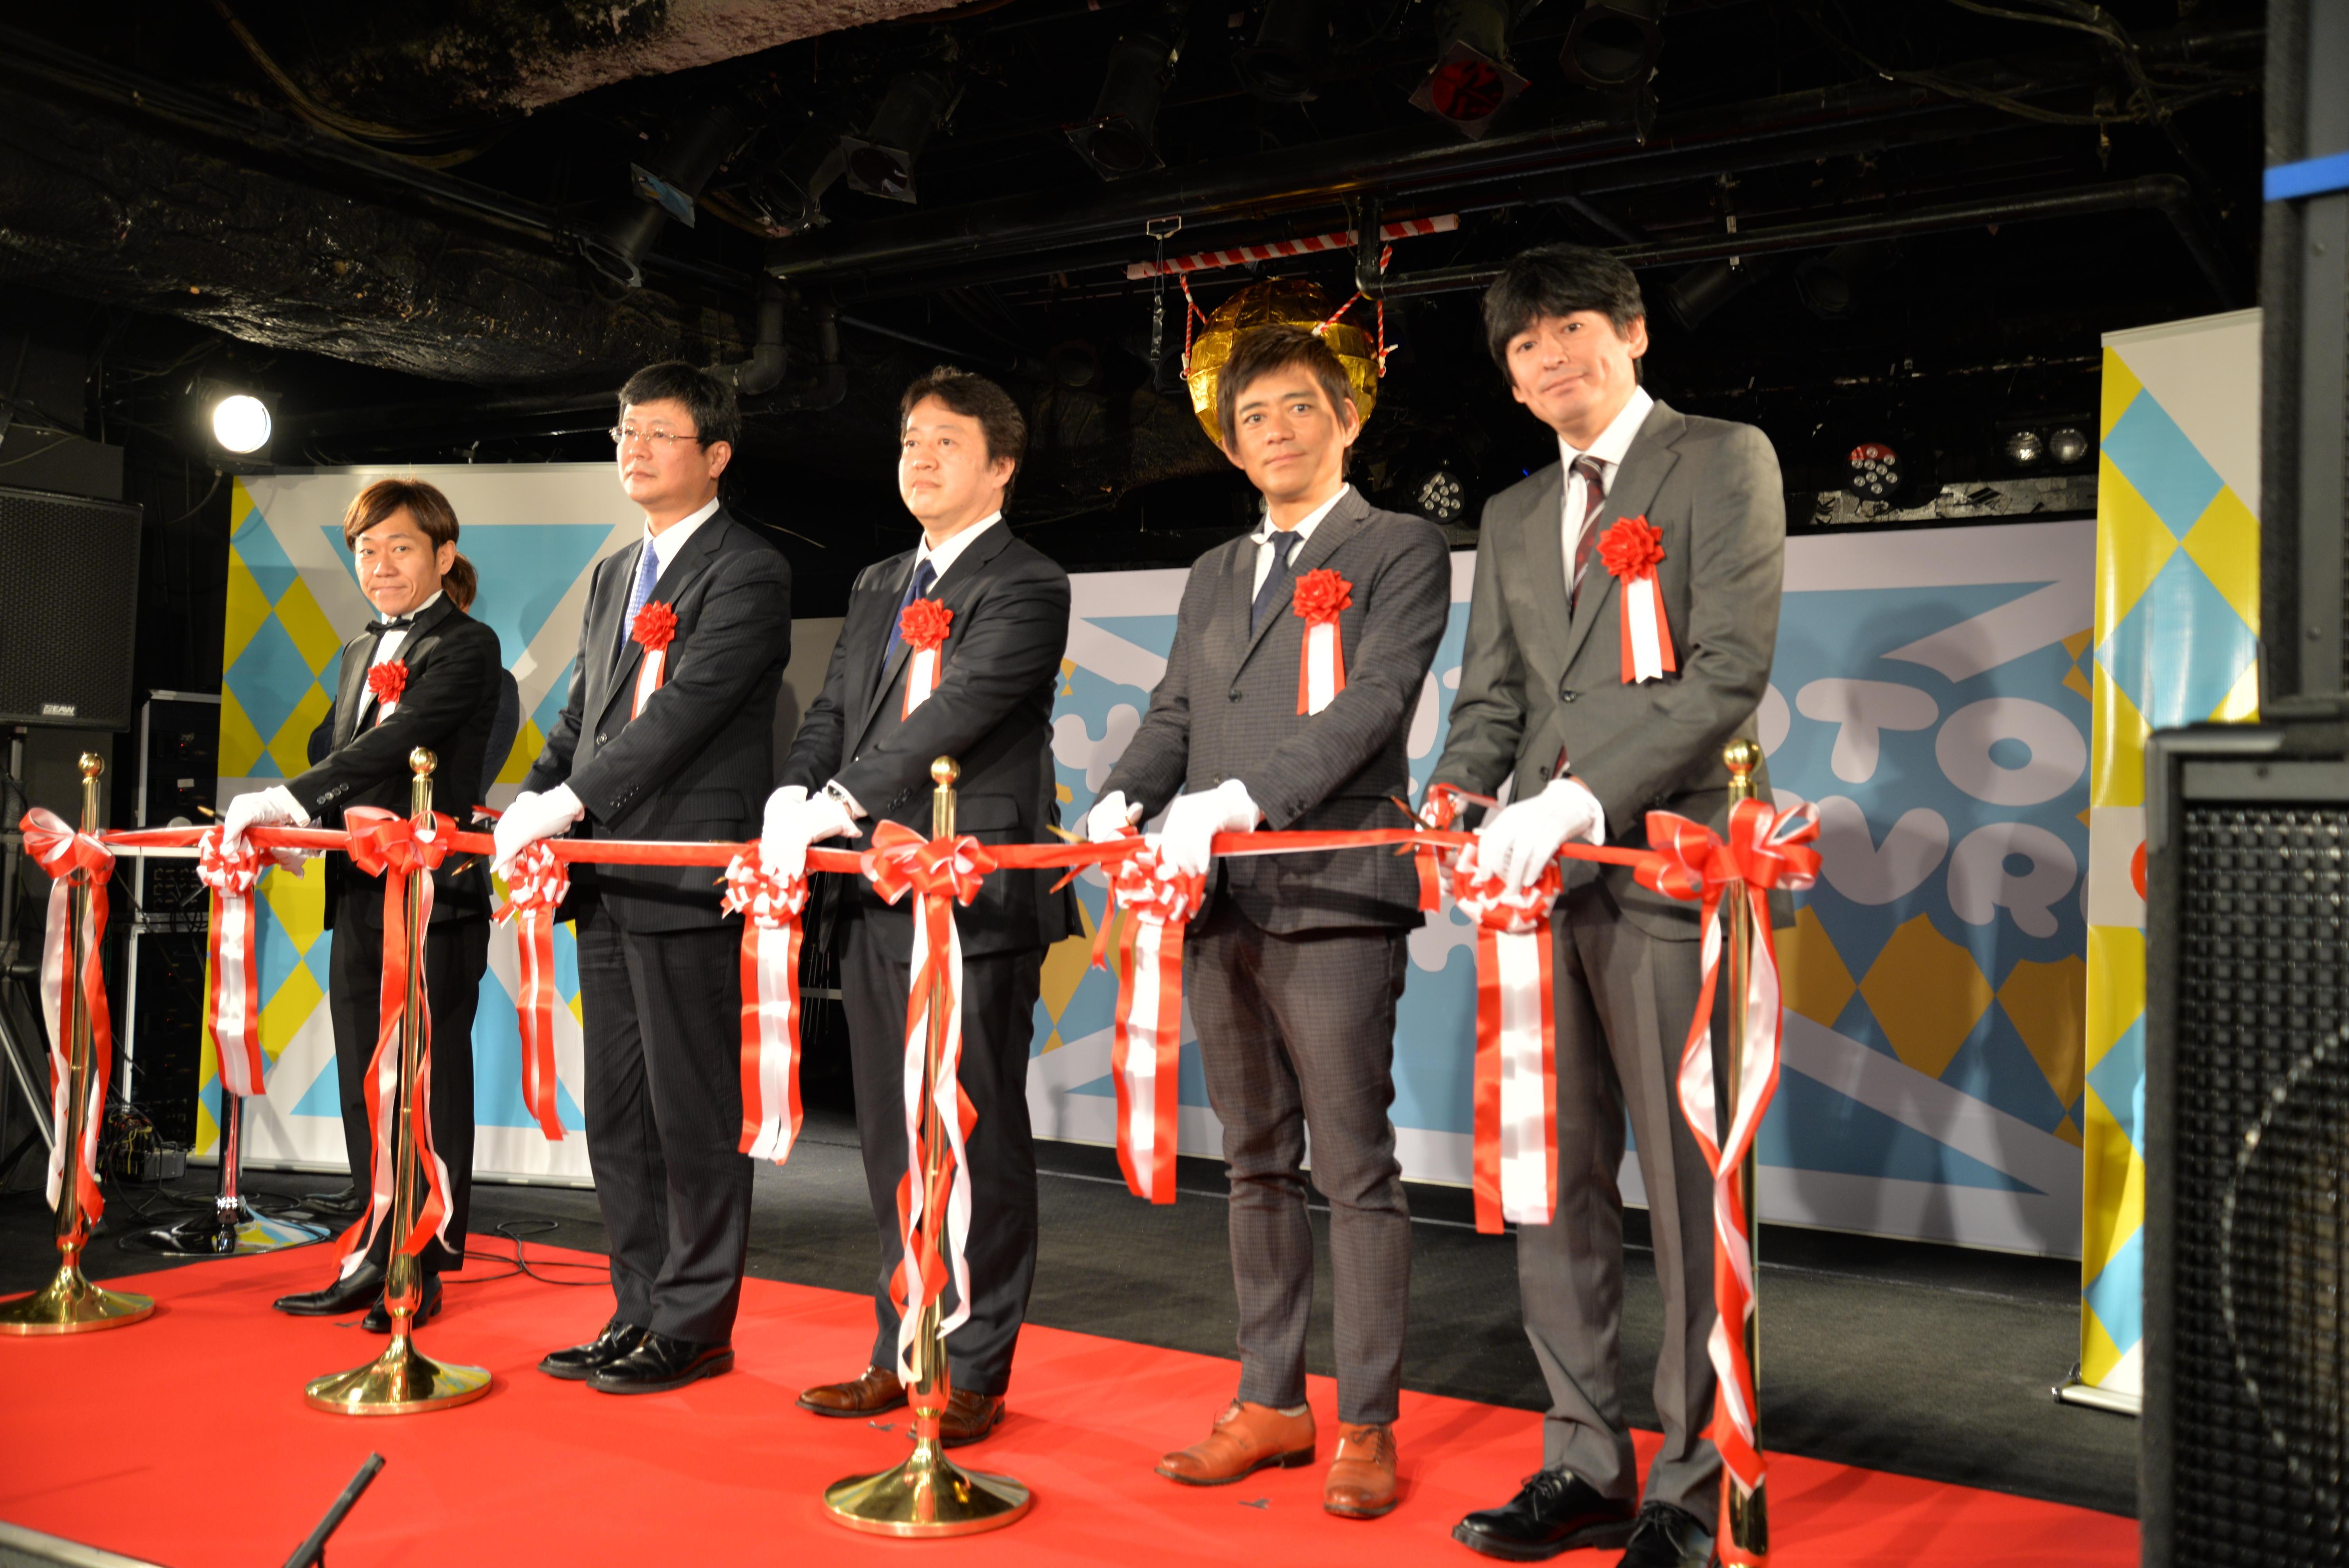 http://news.yoshimoto.co.jp/20180904160326-cfee68597c6904b6d7b79187261b205c8c360890.jpg